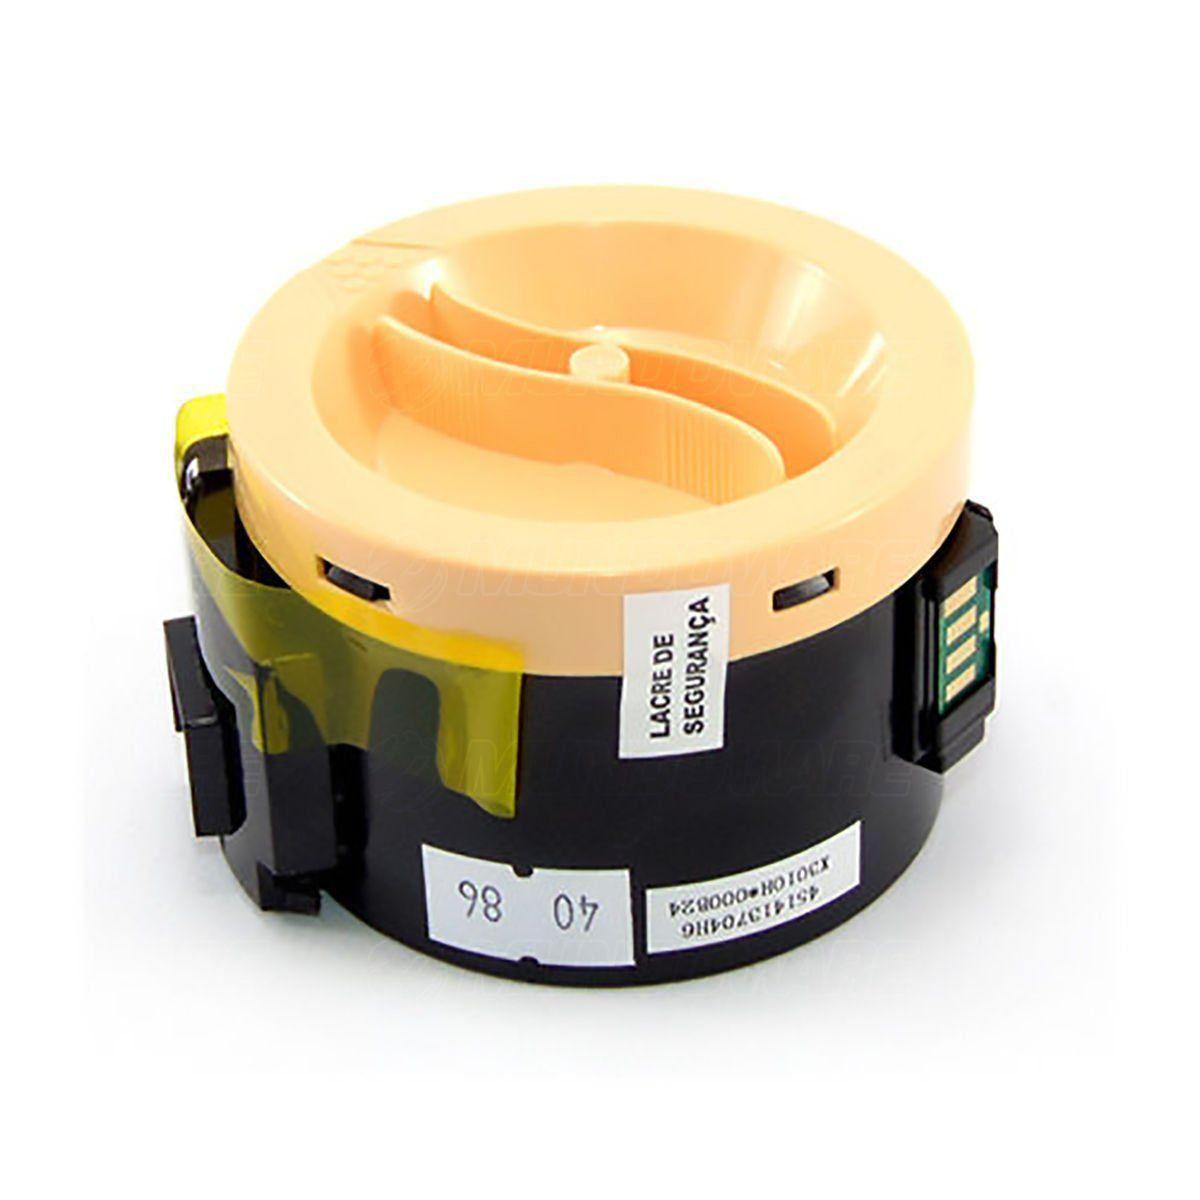 Compatível: Toner X3010H 106R02182 para Xerox WorkCentre 3045 3045b 3045ni 3045bno Phaser 3010 3040 / Preto / 2.200